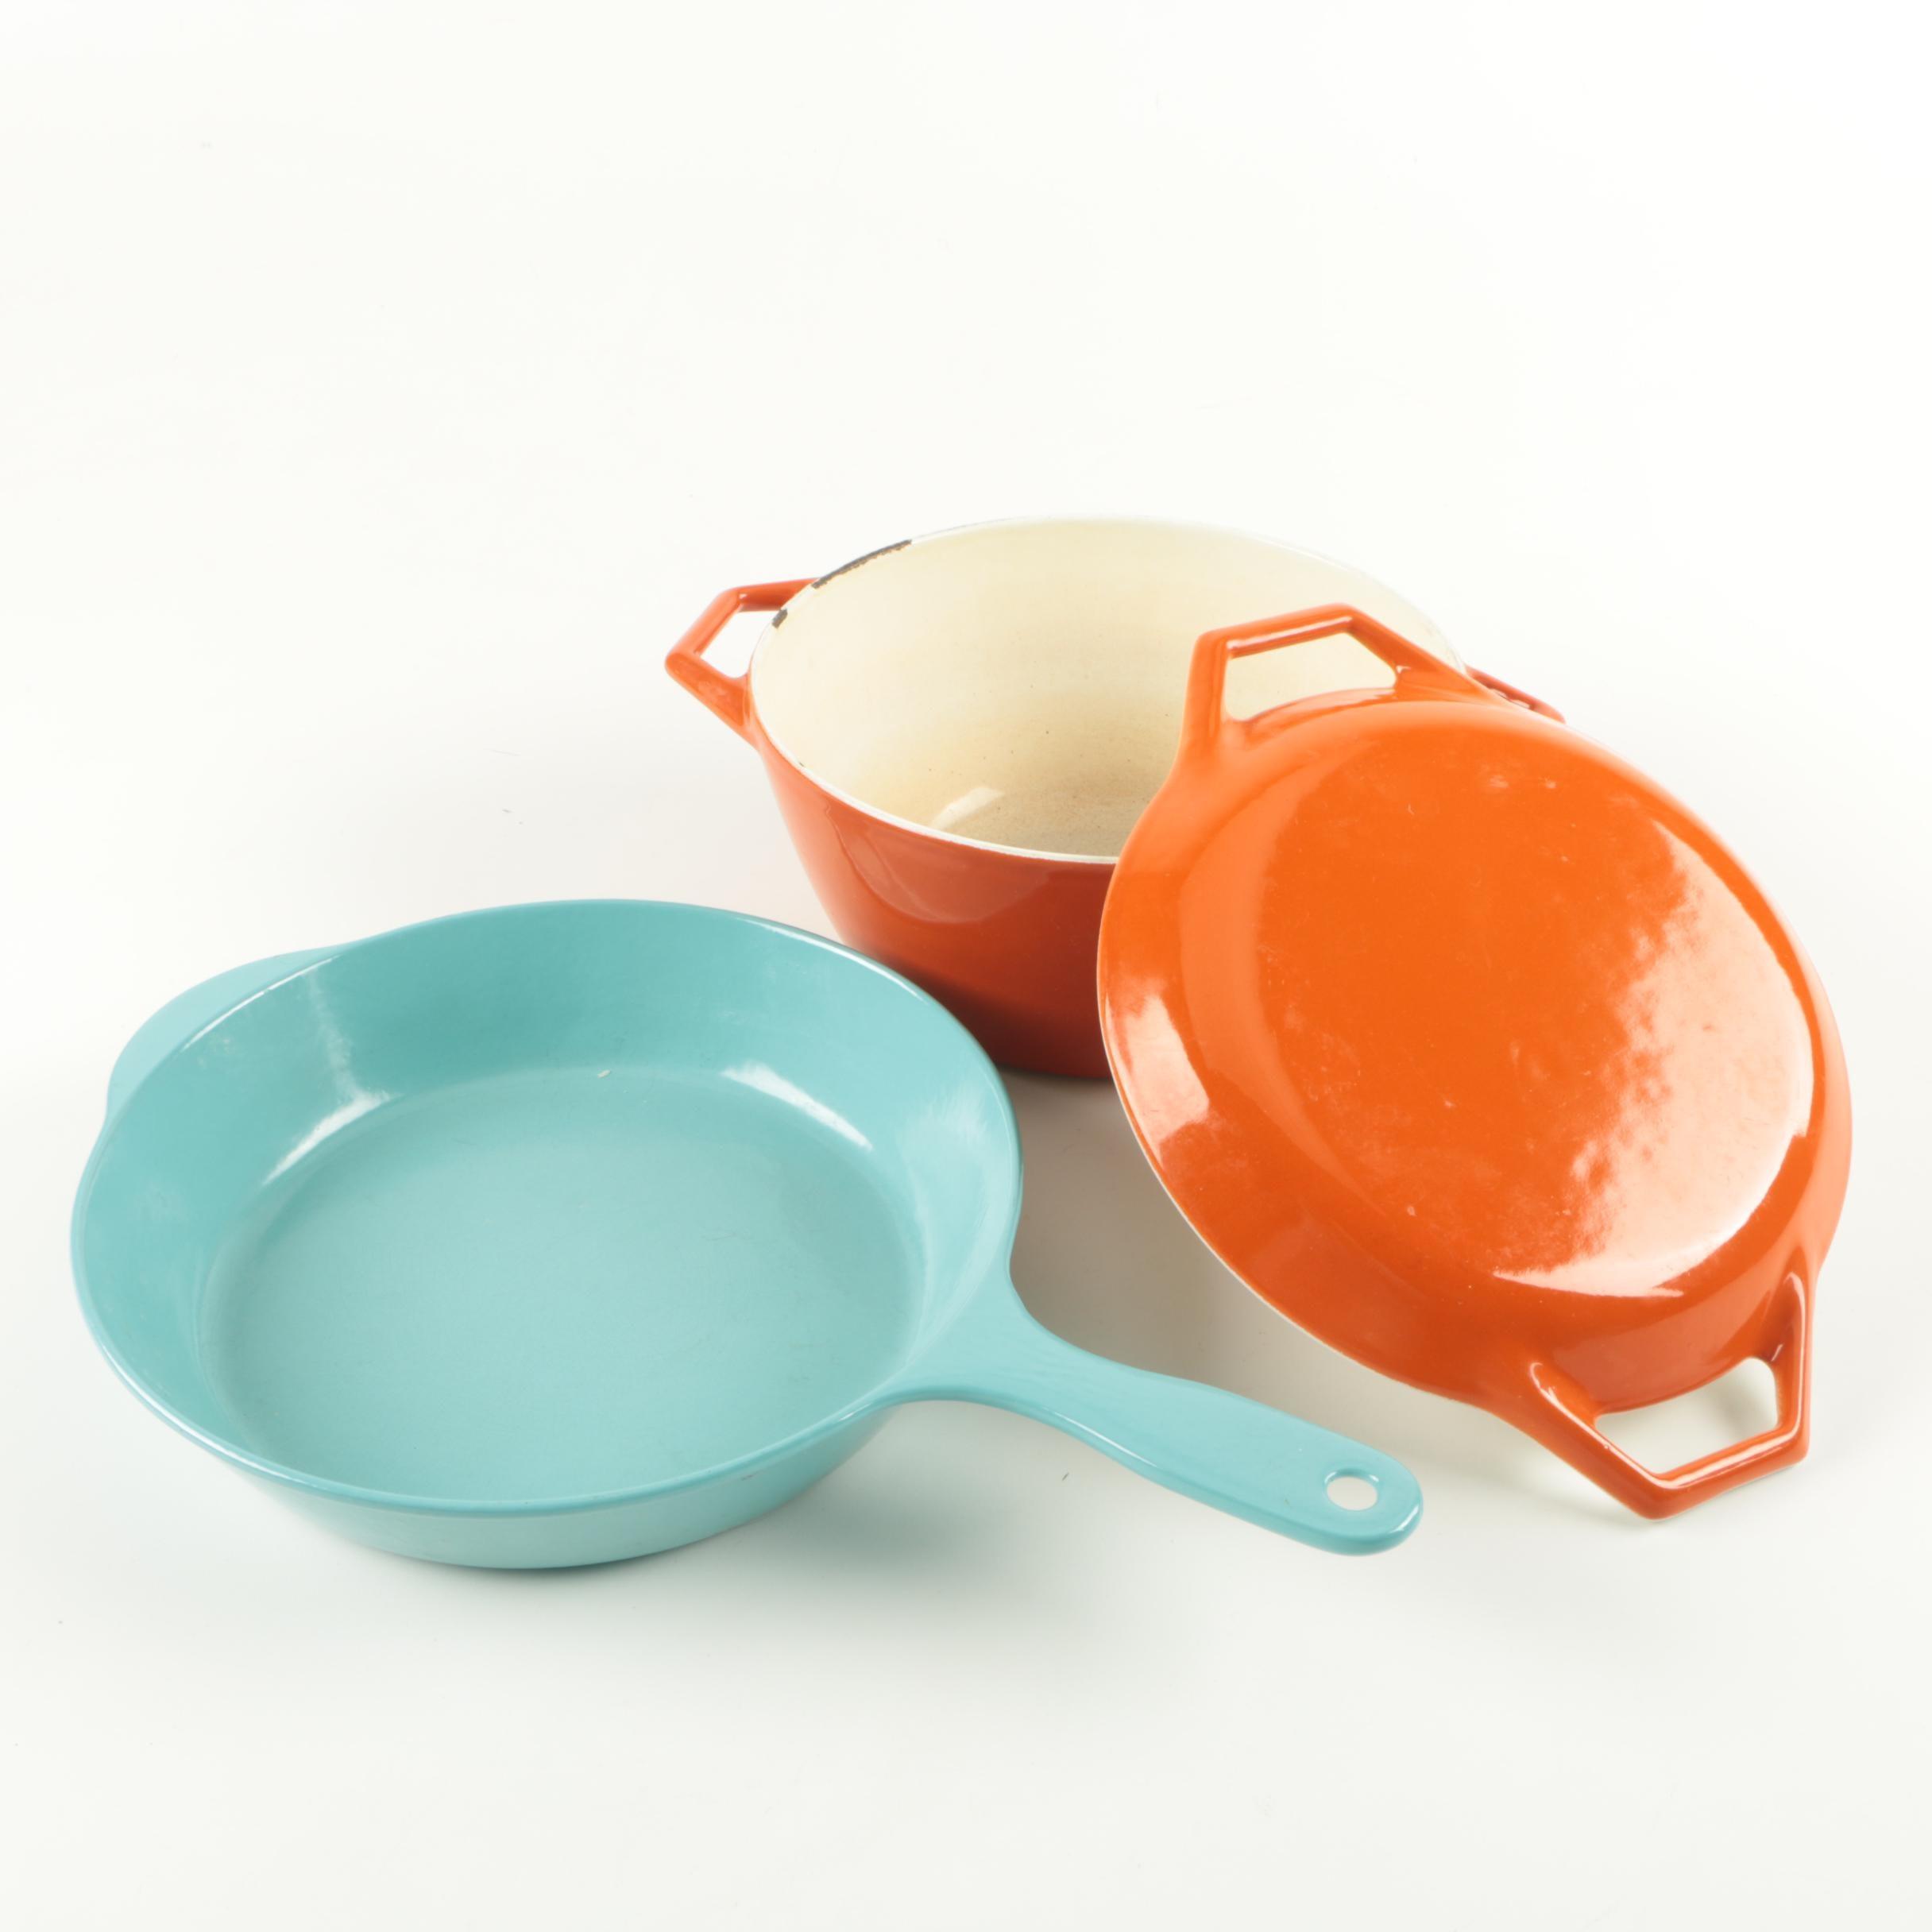 Vintage Prizer-Ware and Copco Cast Enamel Cookware